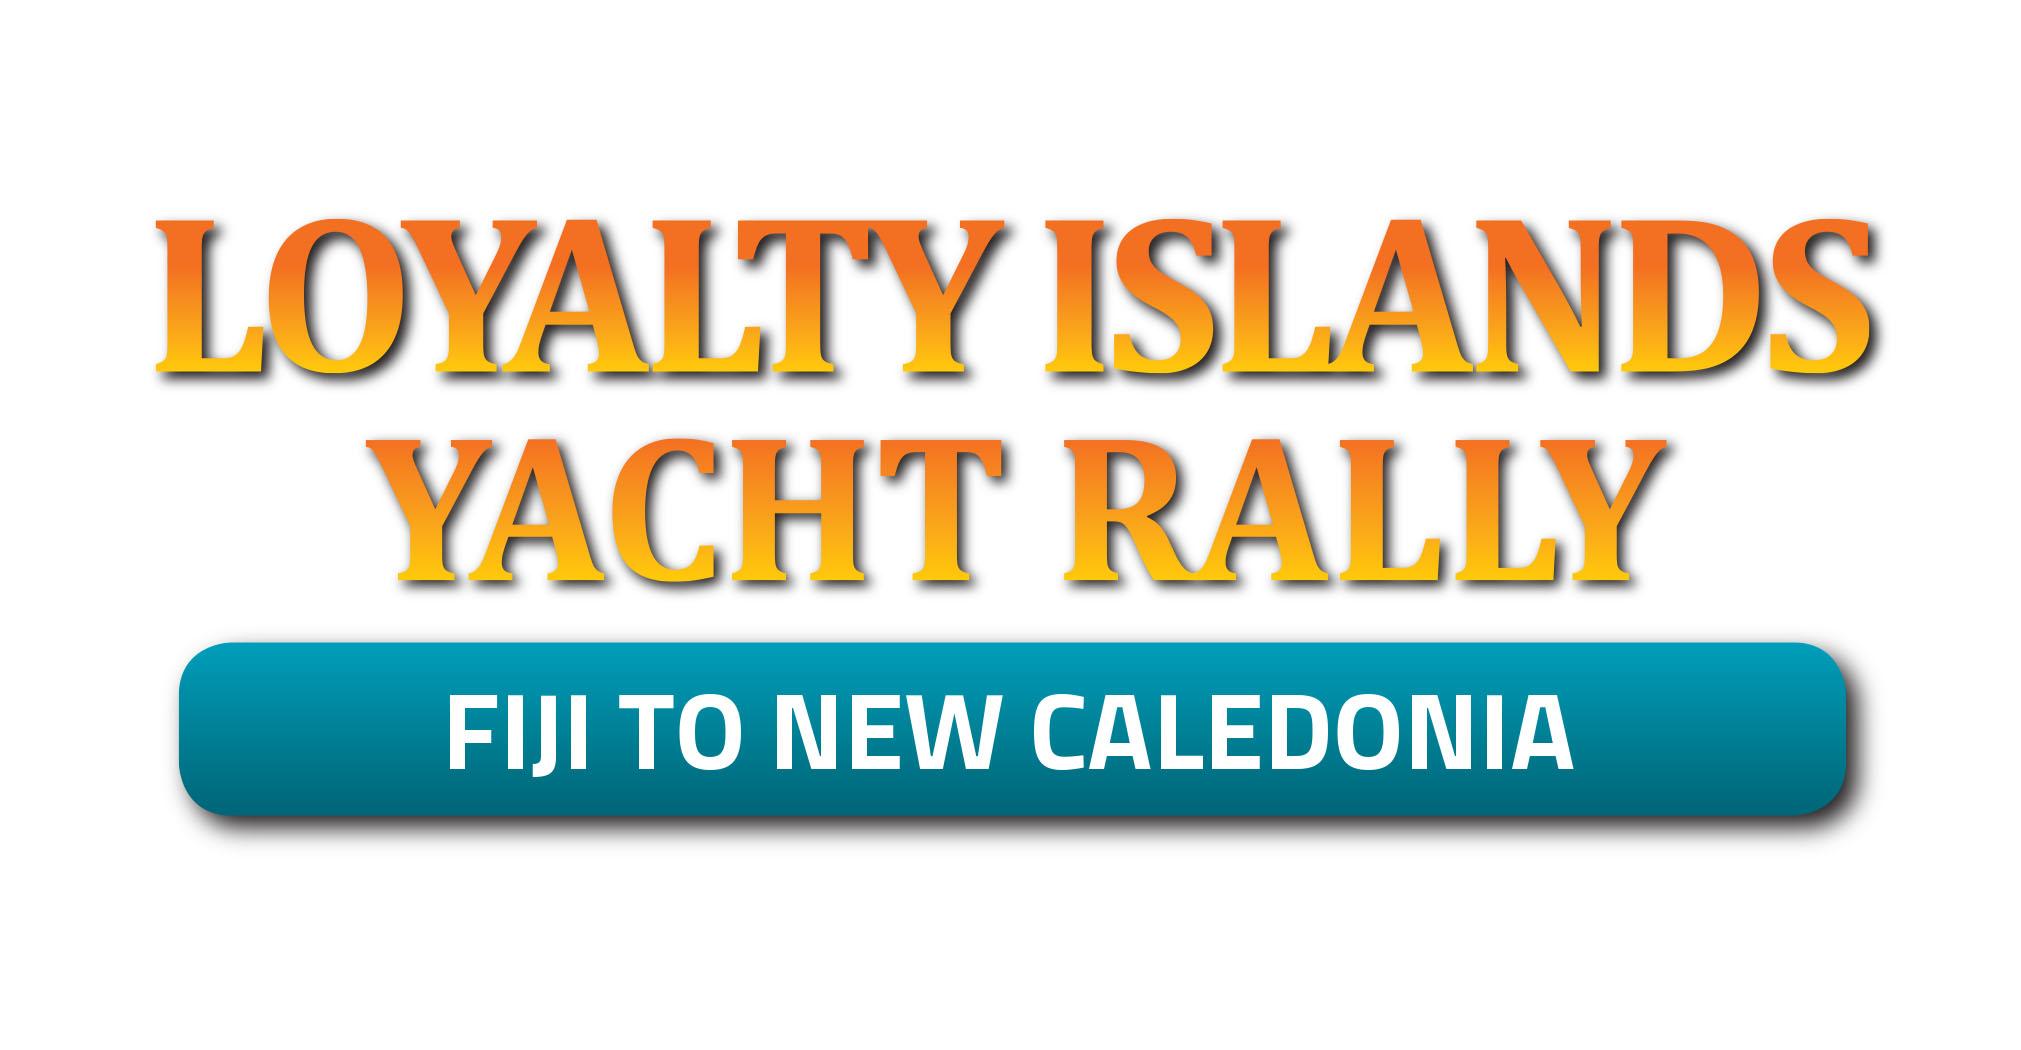 Special Clearance Eastern New Caledonia. - *Departs Fiji or Vanuatu September